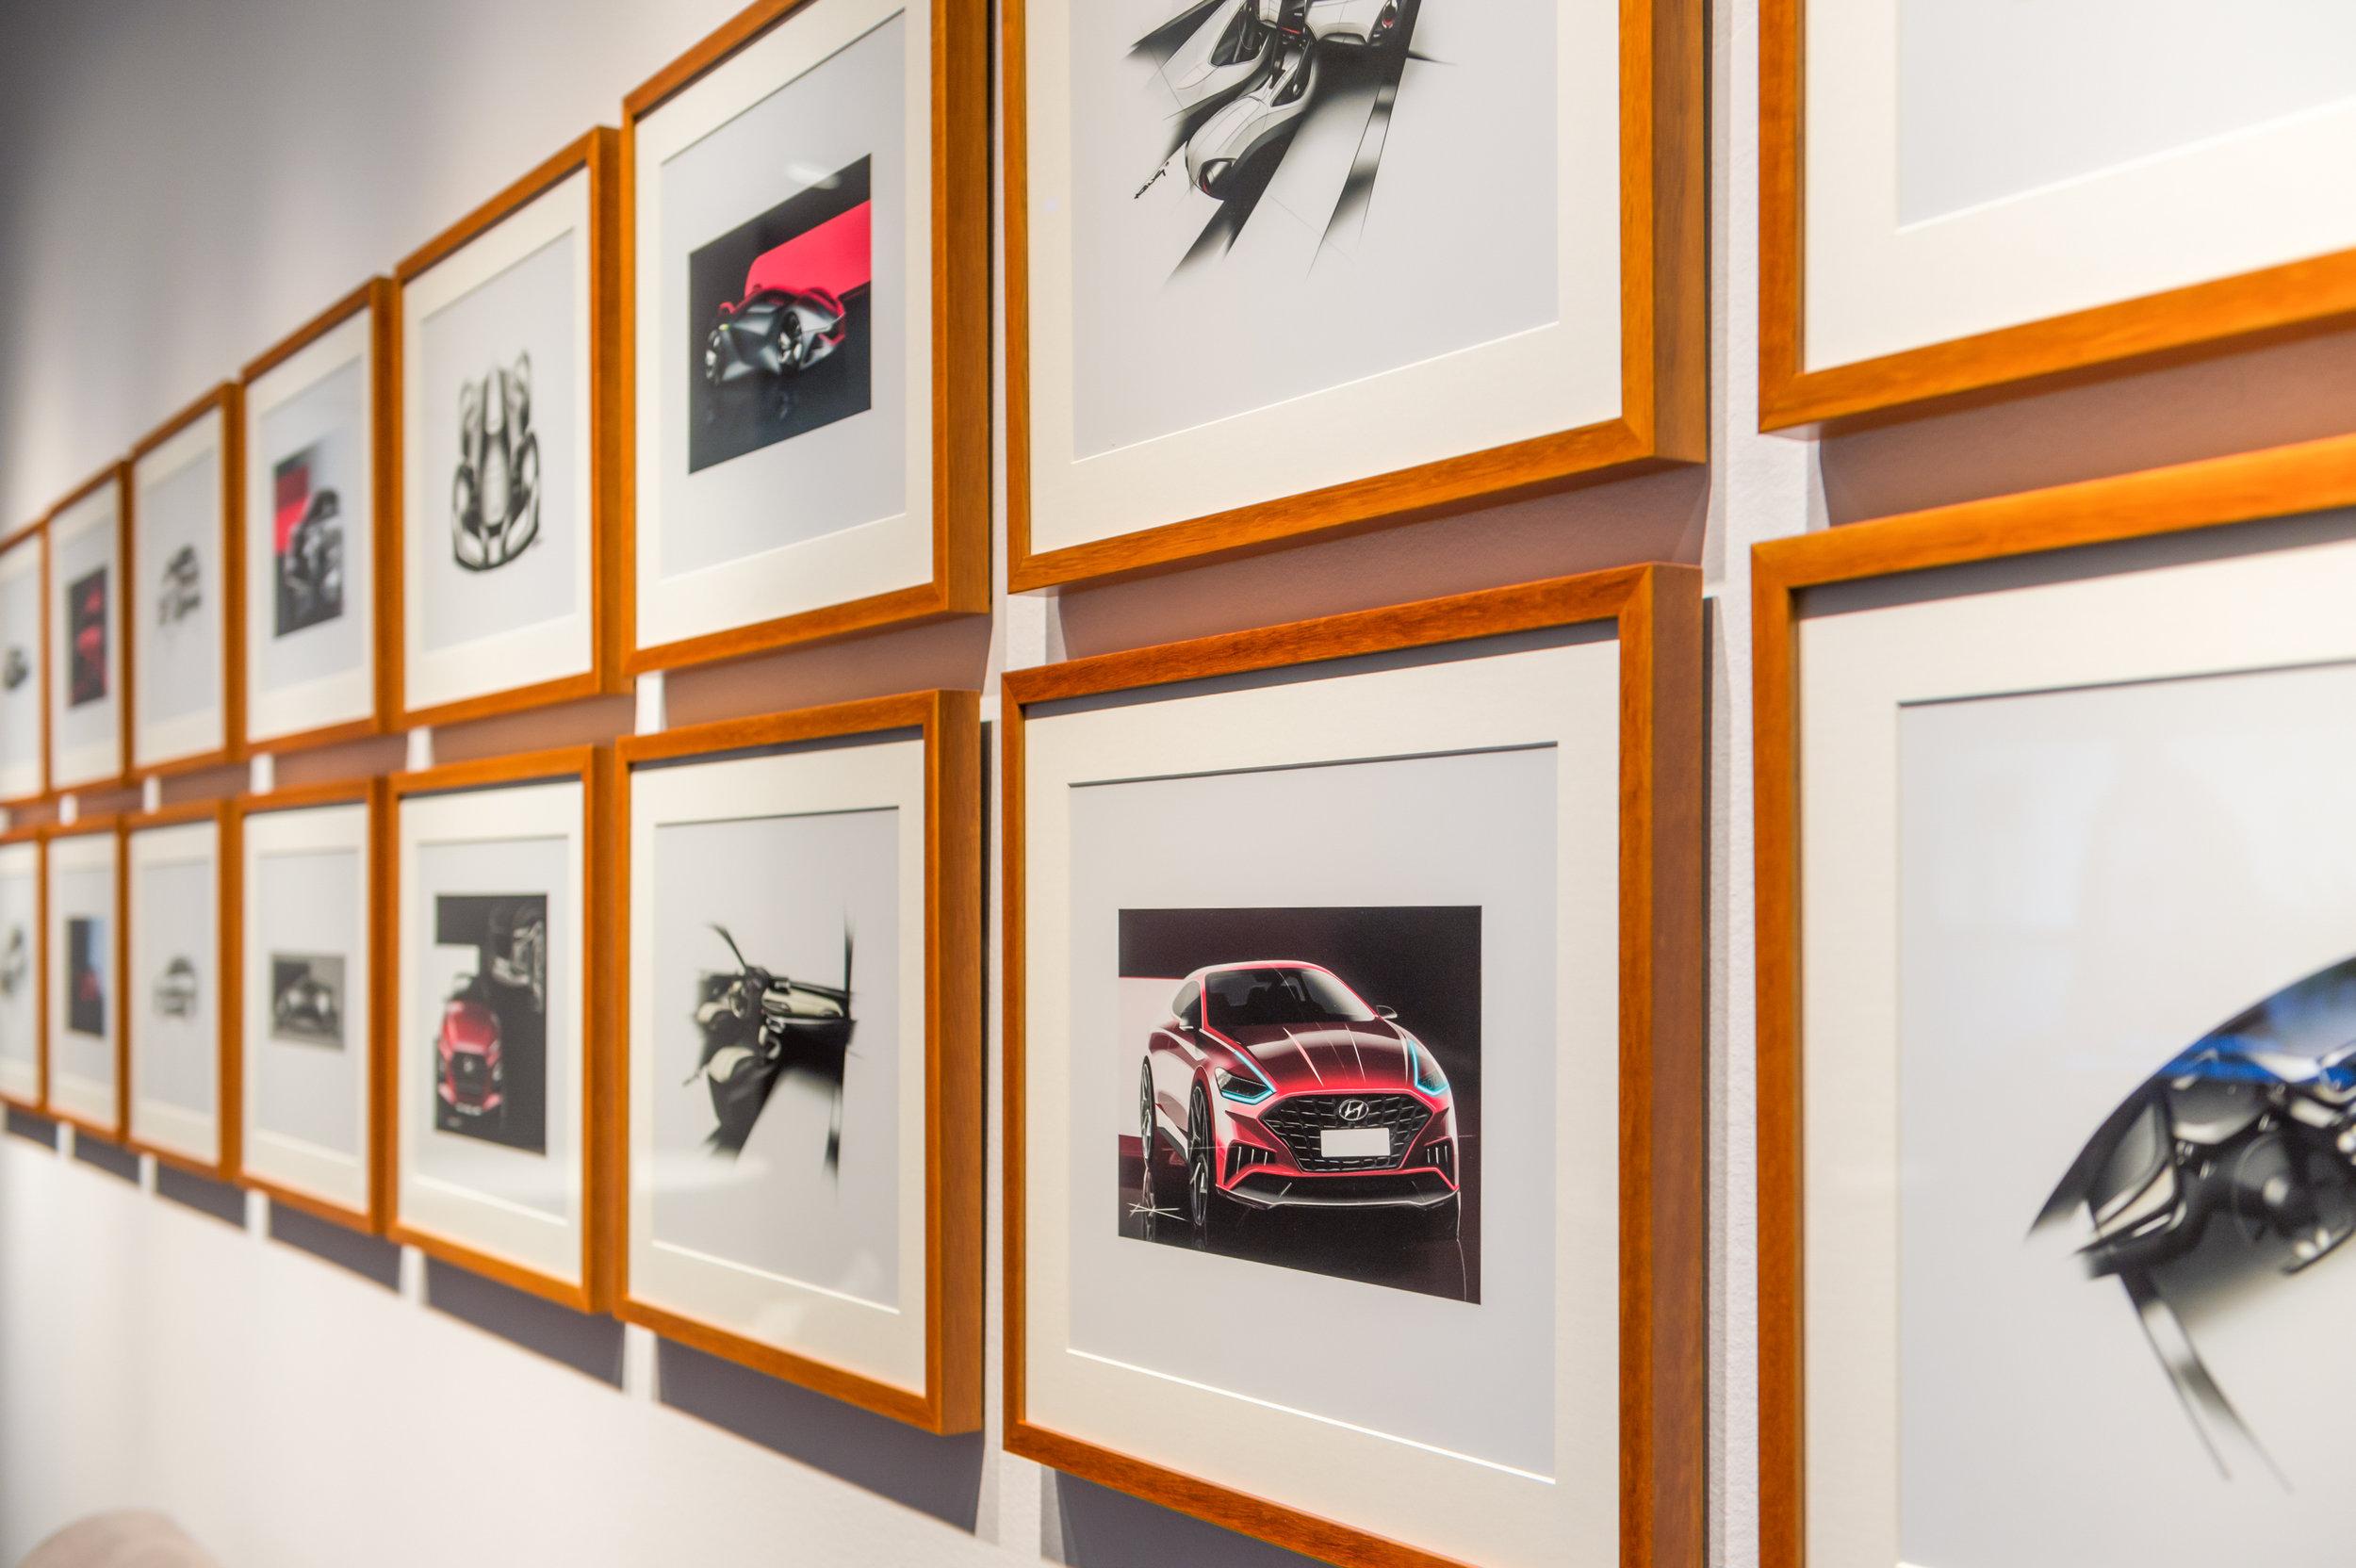 OHelloMedia-Hyundai-Christie'sAuctionHouse-TopSelect-53.jpg